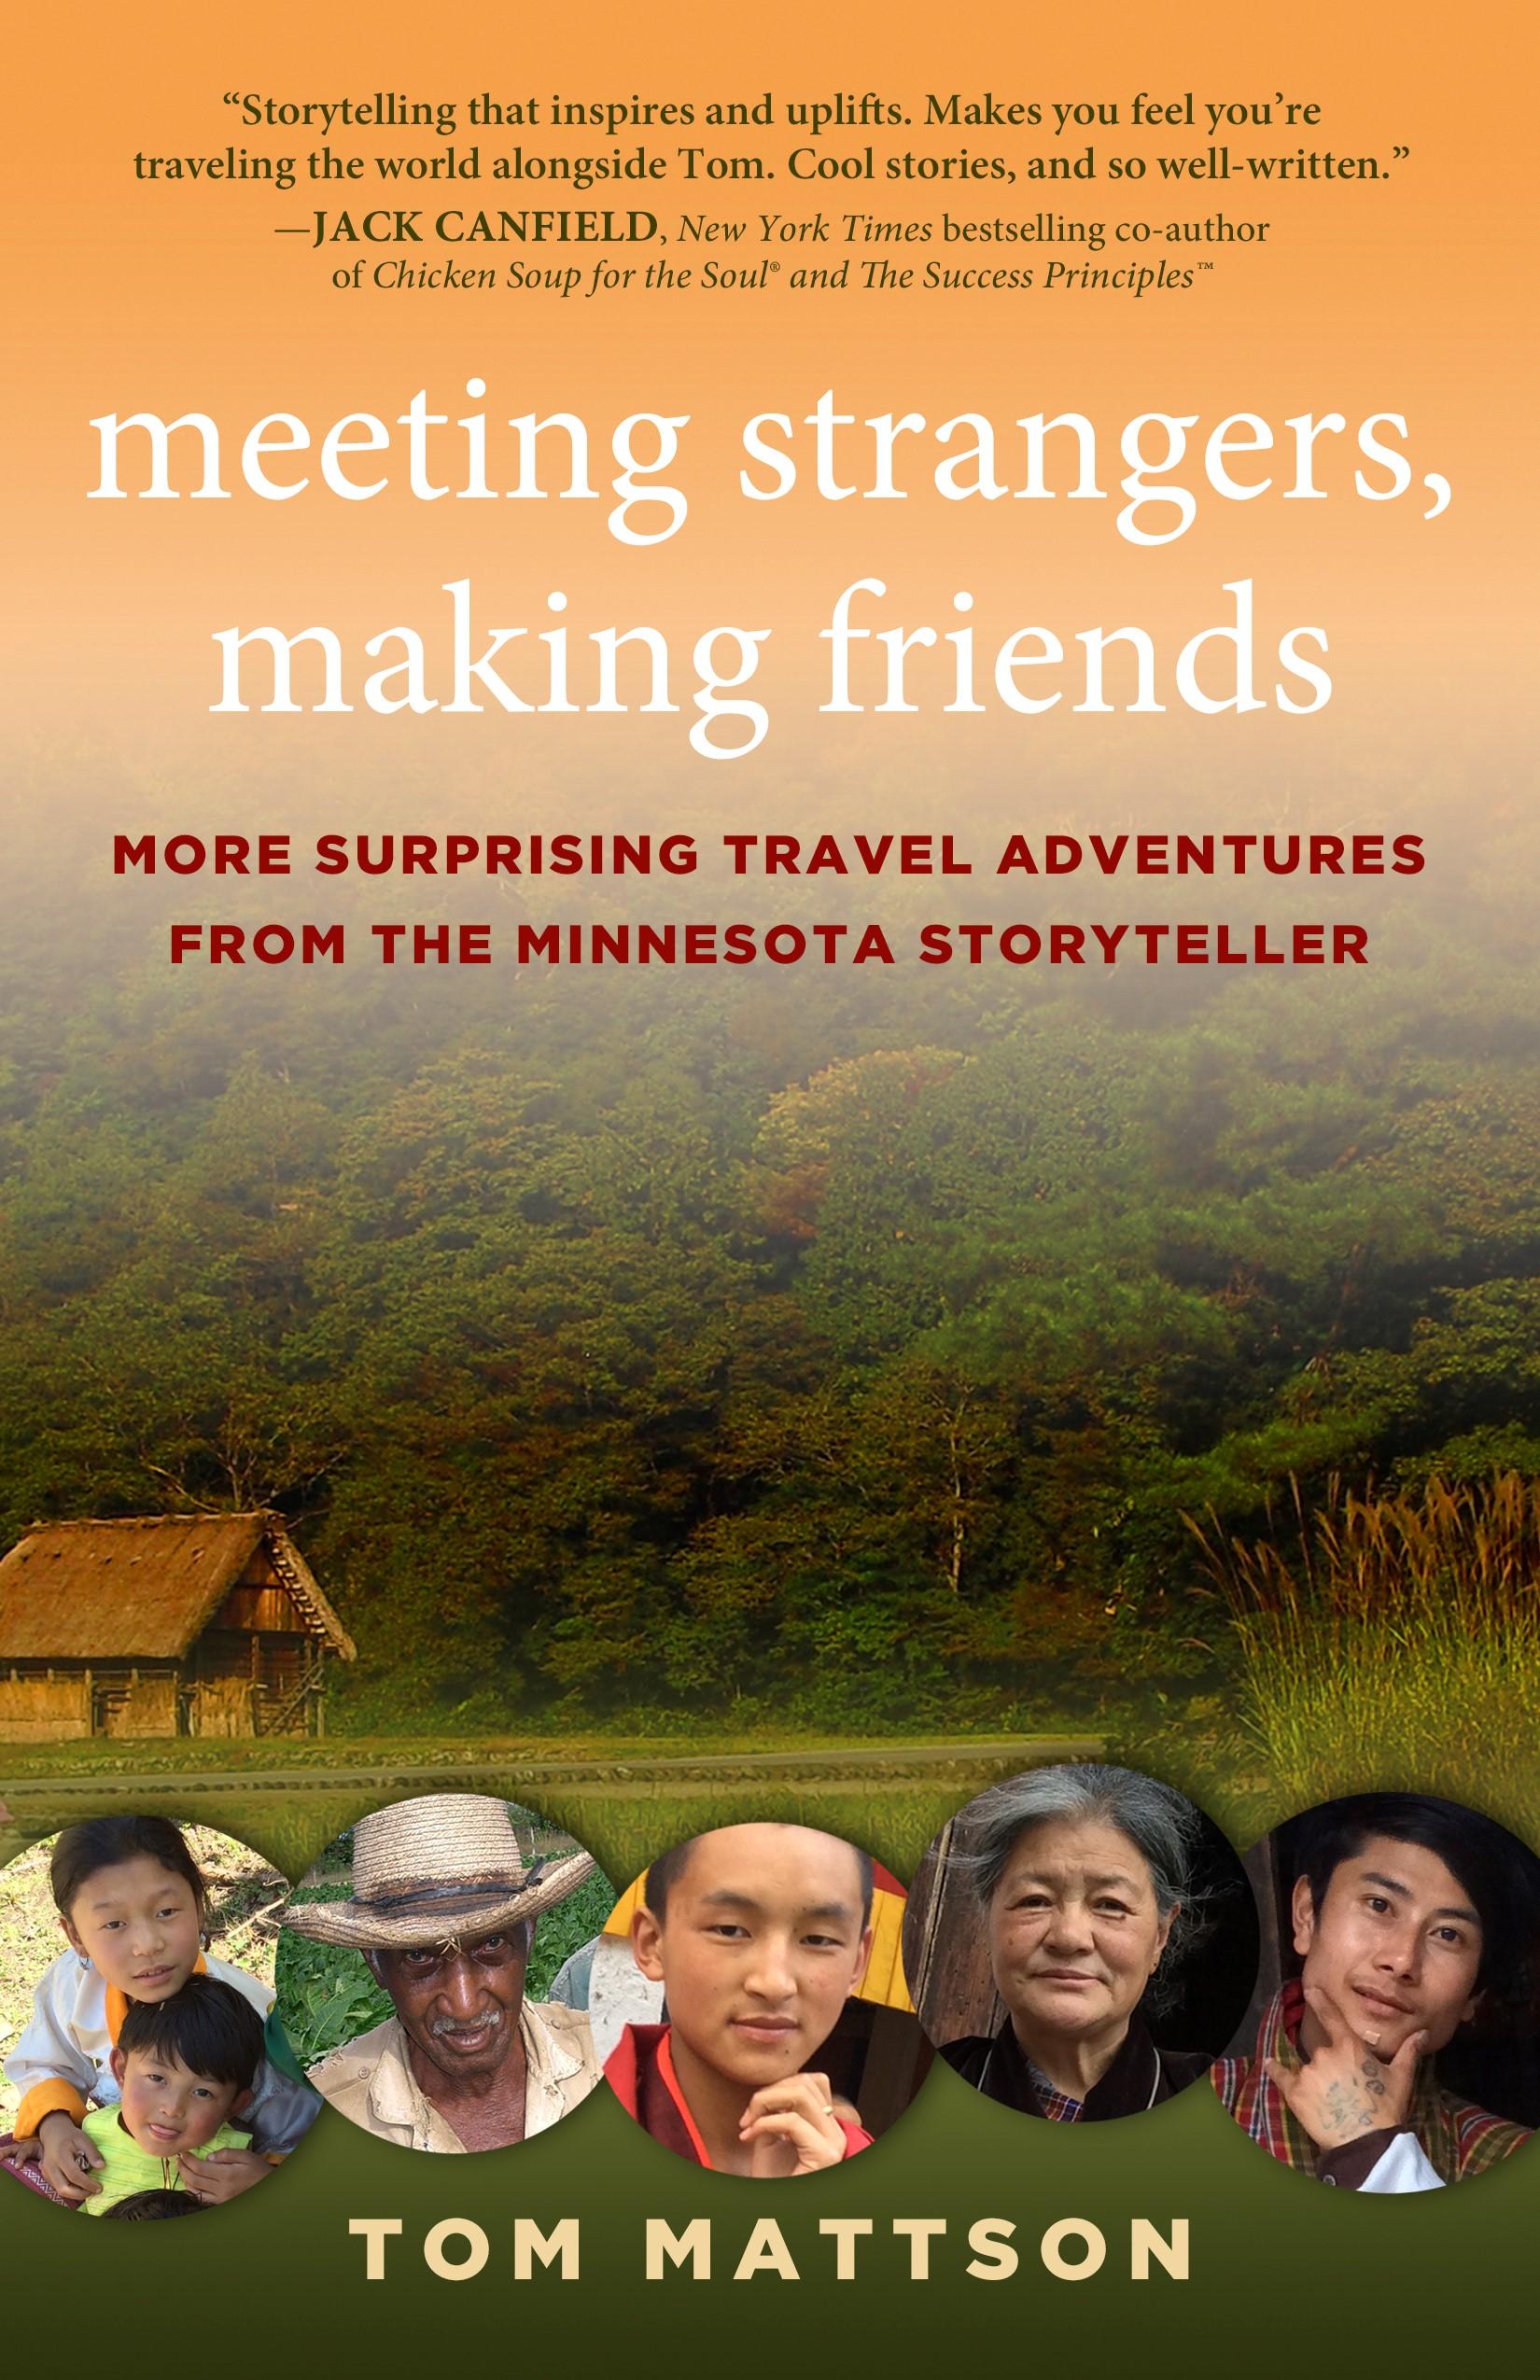 Meeting Strangers, Making Friends:  More Surprising Travel Adventures From The Minnesota Storyteller